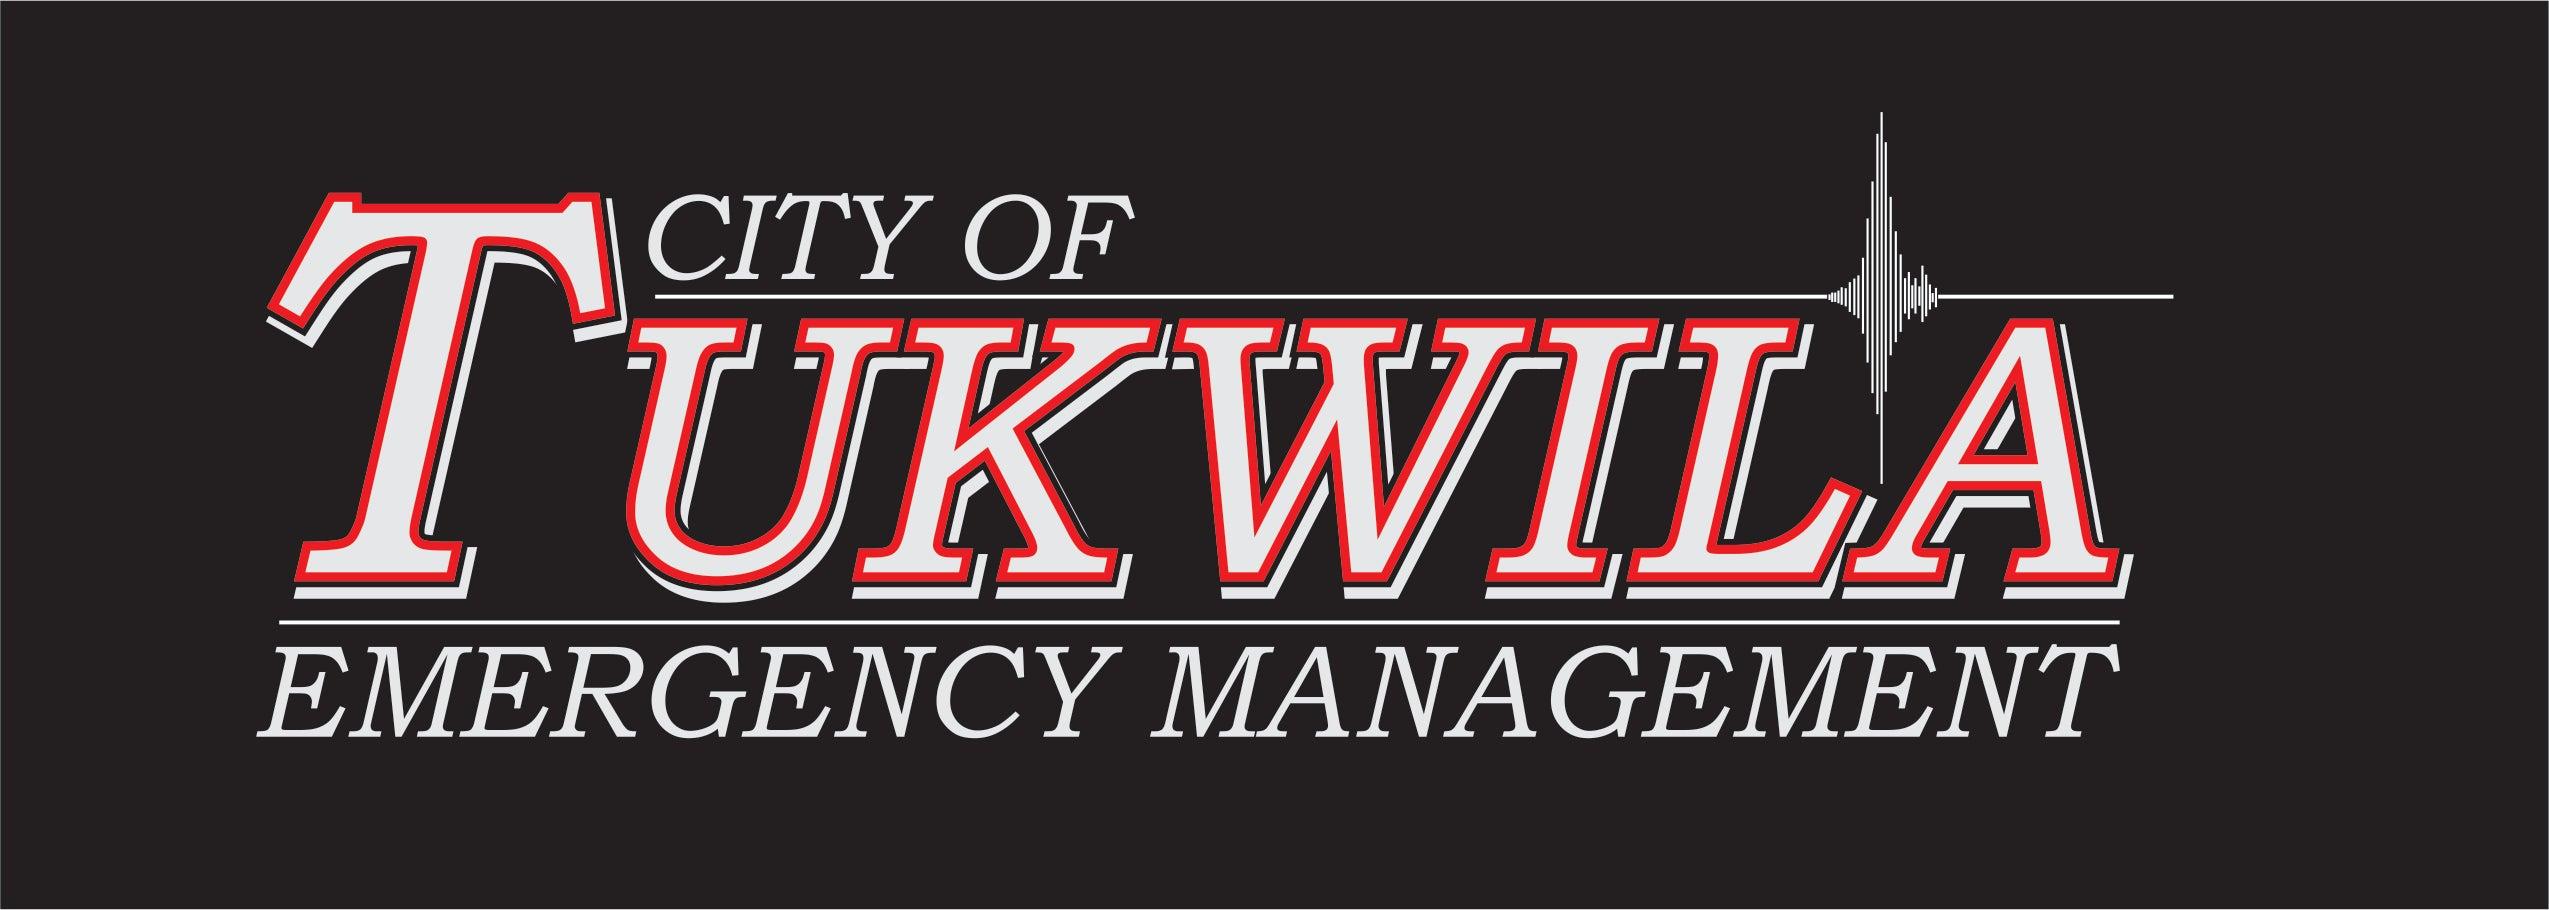 About ALERT King County - City of Tukwila